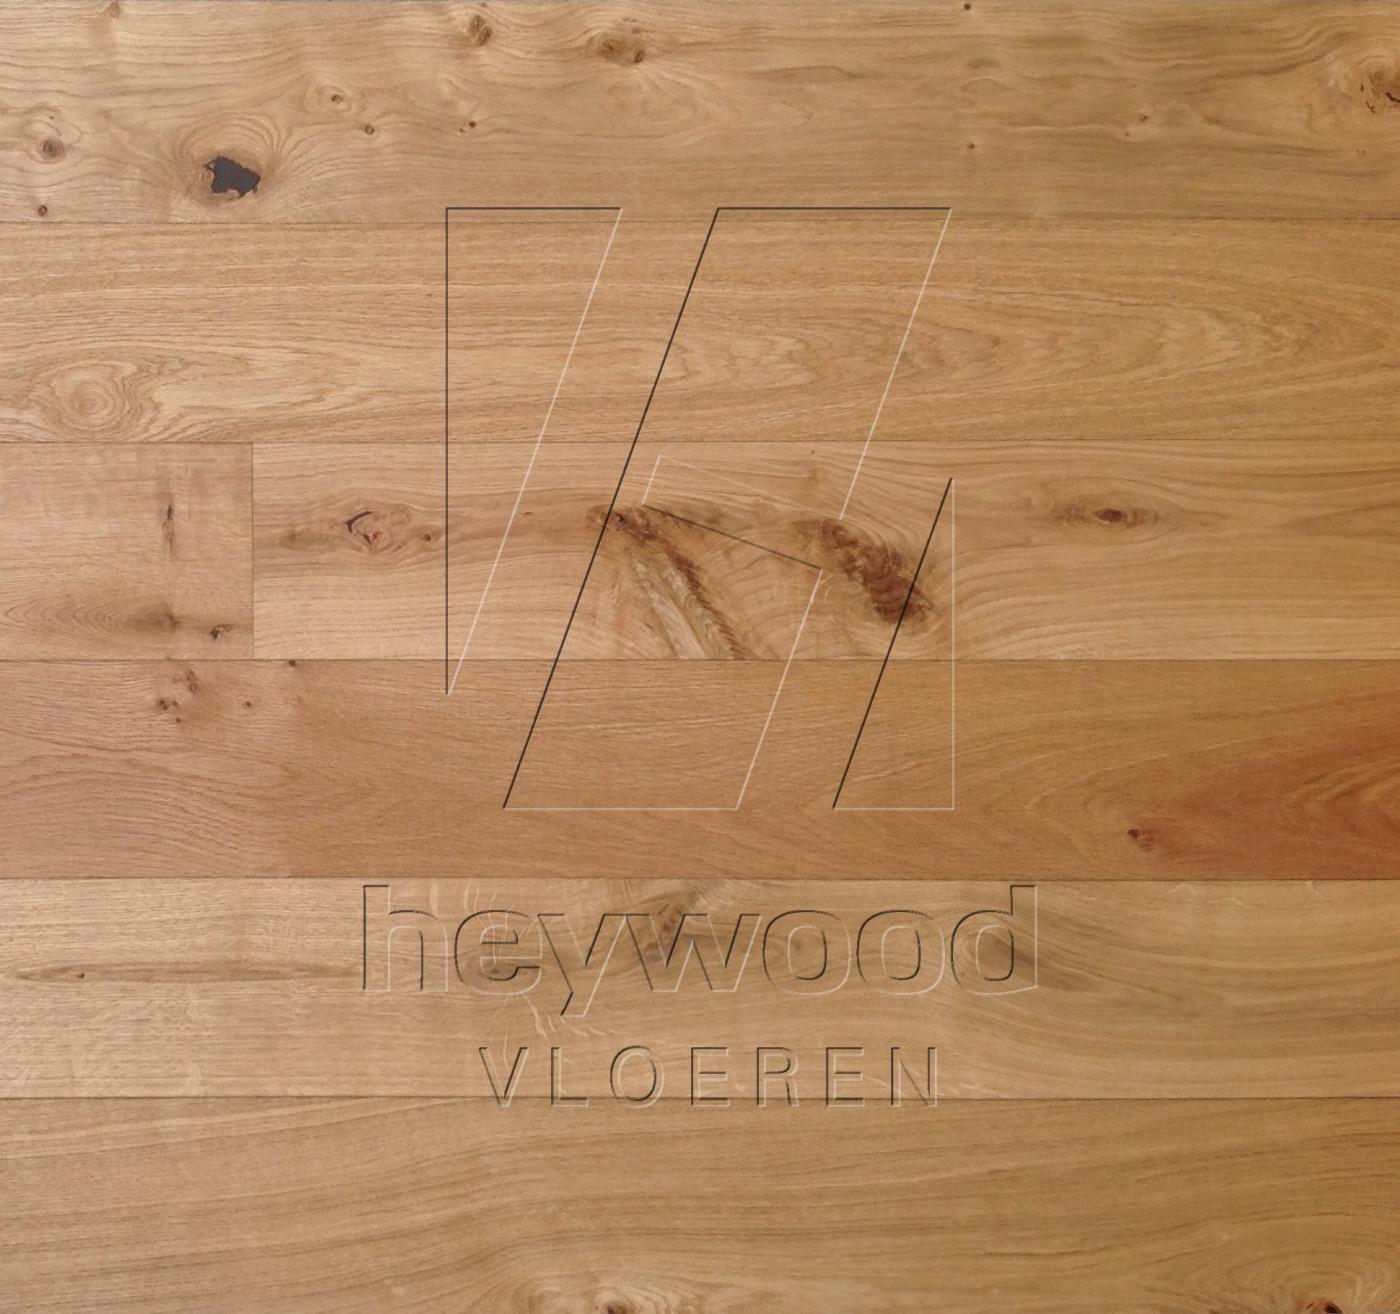 NLH/PSA 'Biscuit' 10/3mm or 15/4mm in European Oak Character of Bespoke Wooden Floors